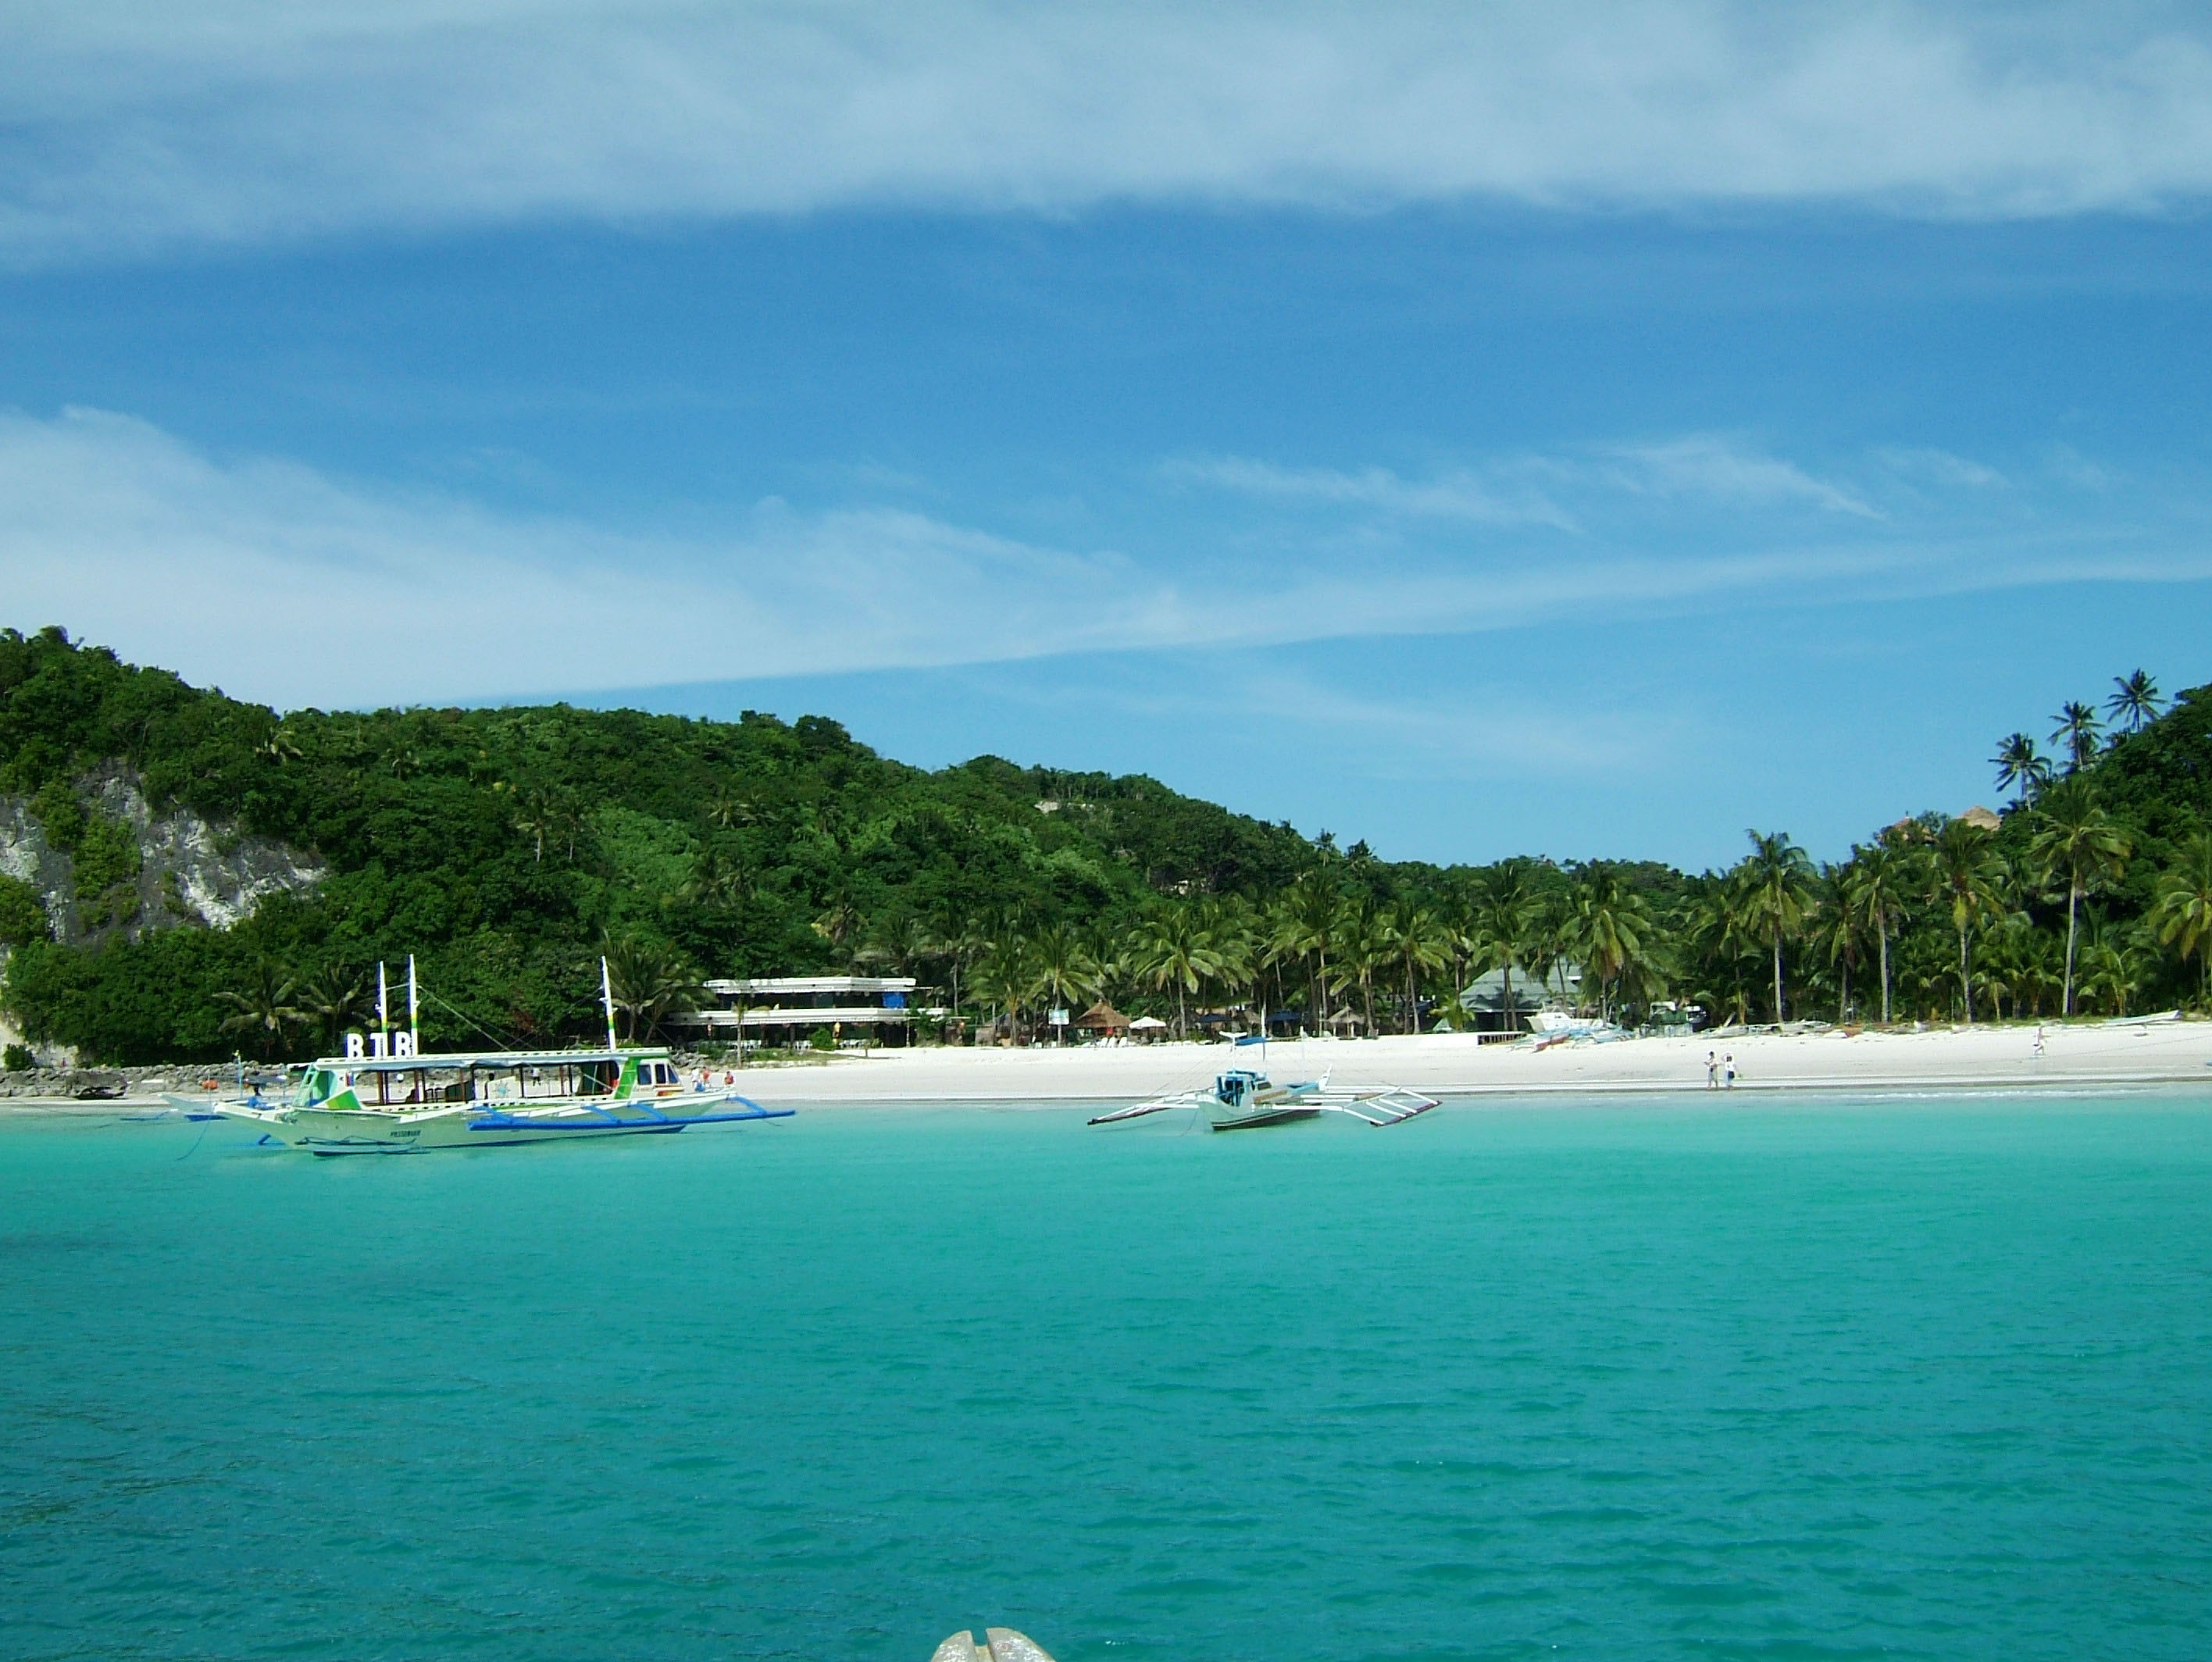 Philippines Panay Negros Sugar Islands Caticlan Boracay Beach Chairs 200604 06